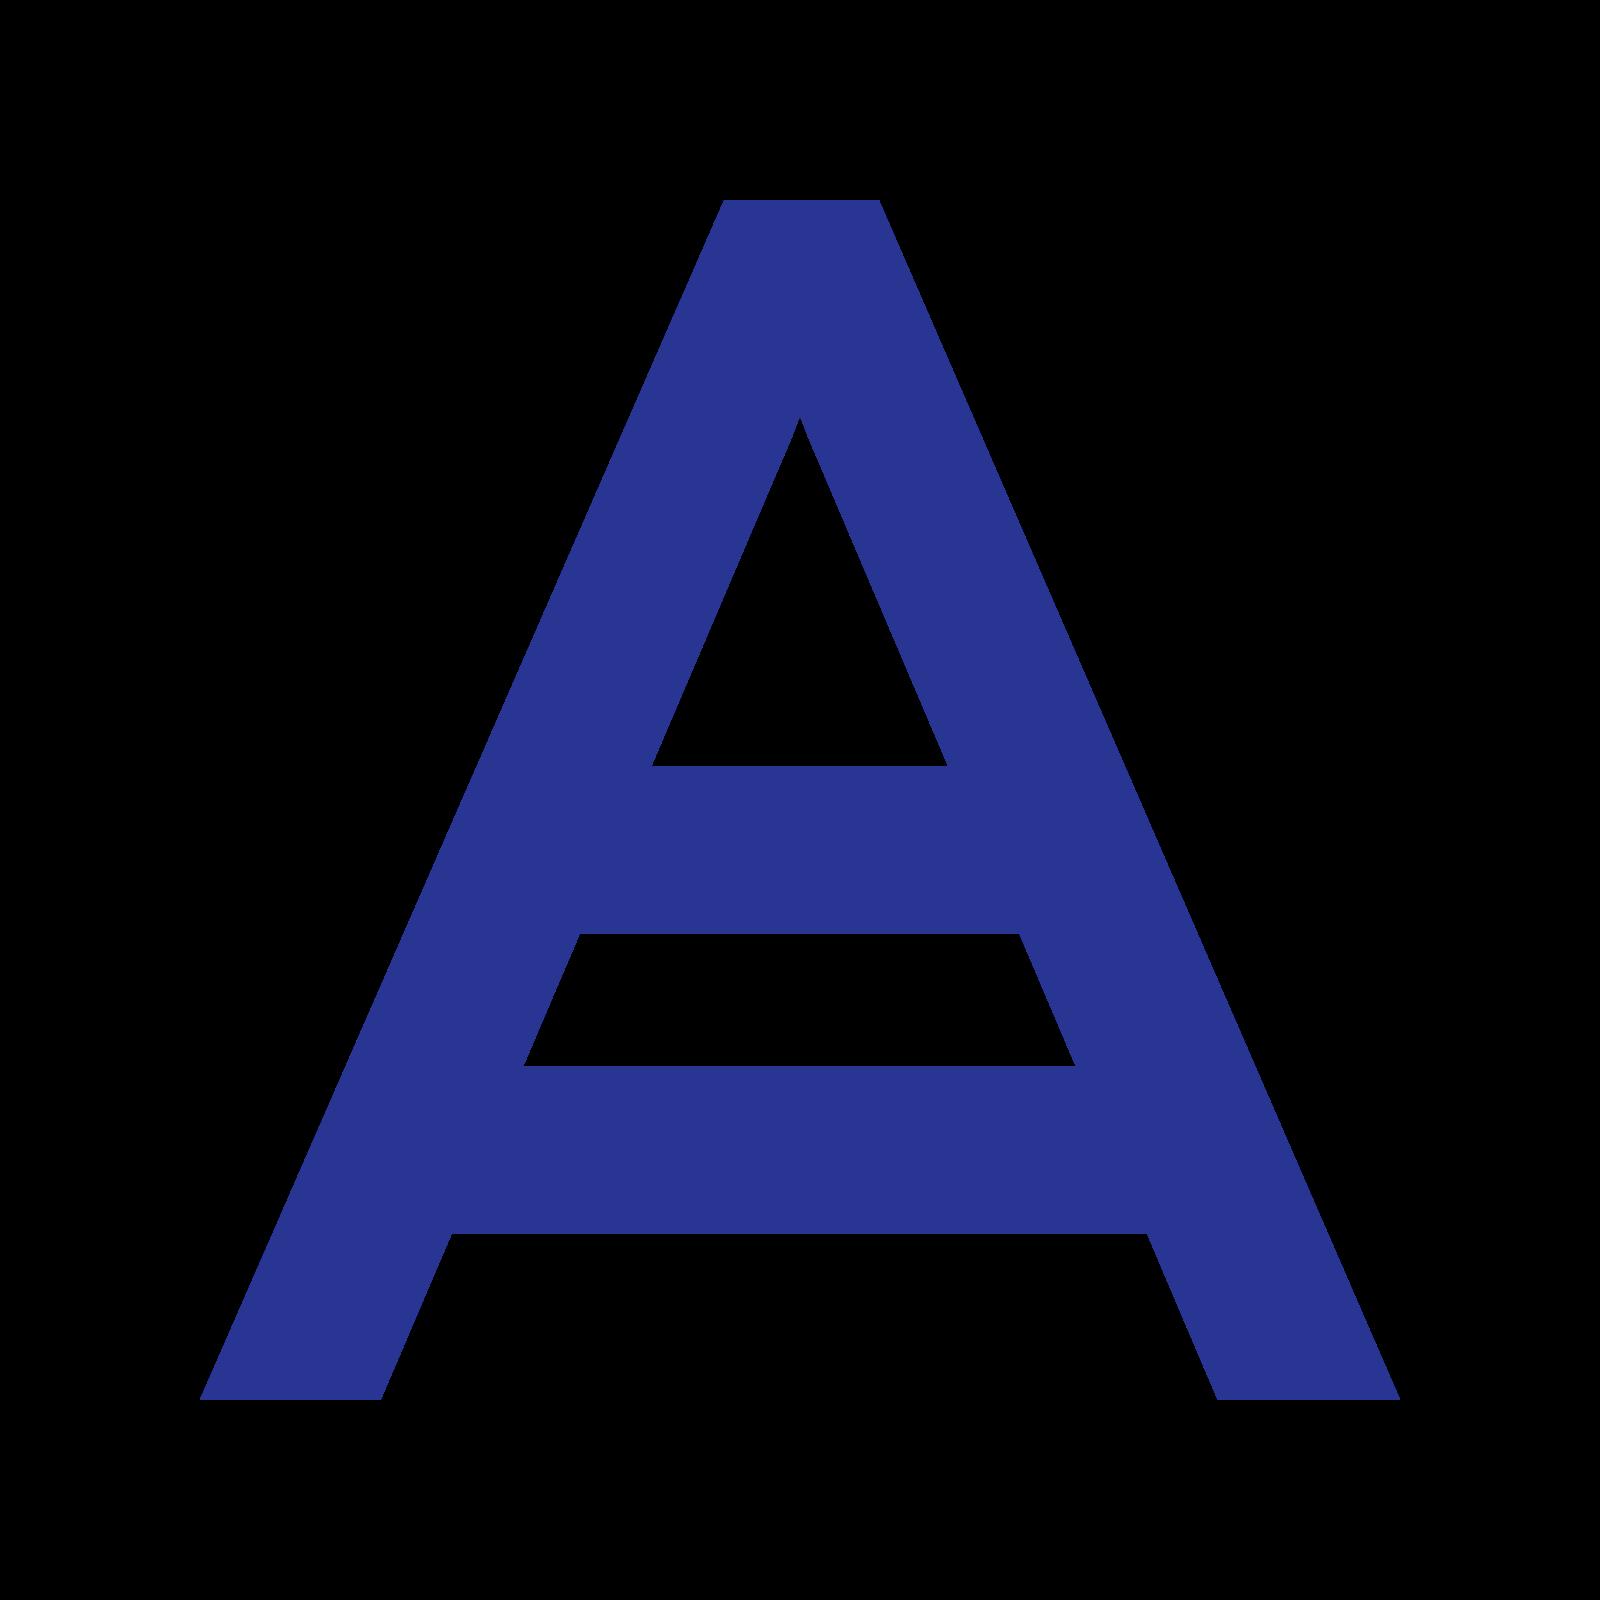 Acronis icon